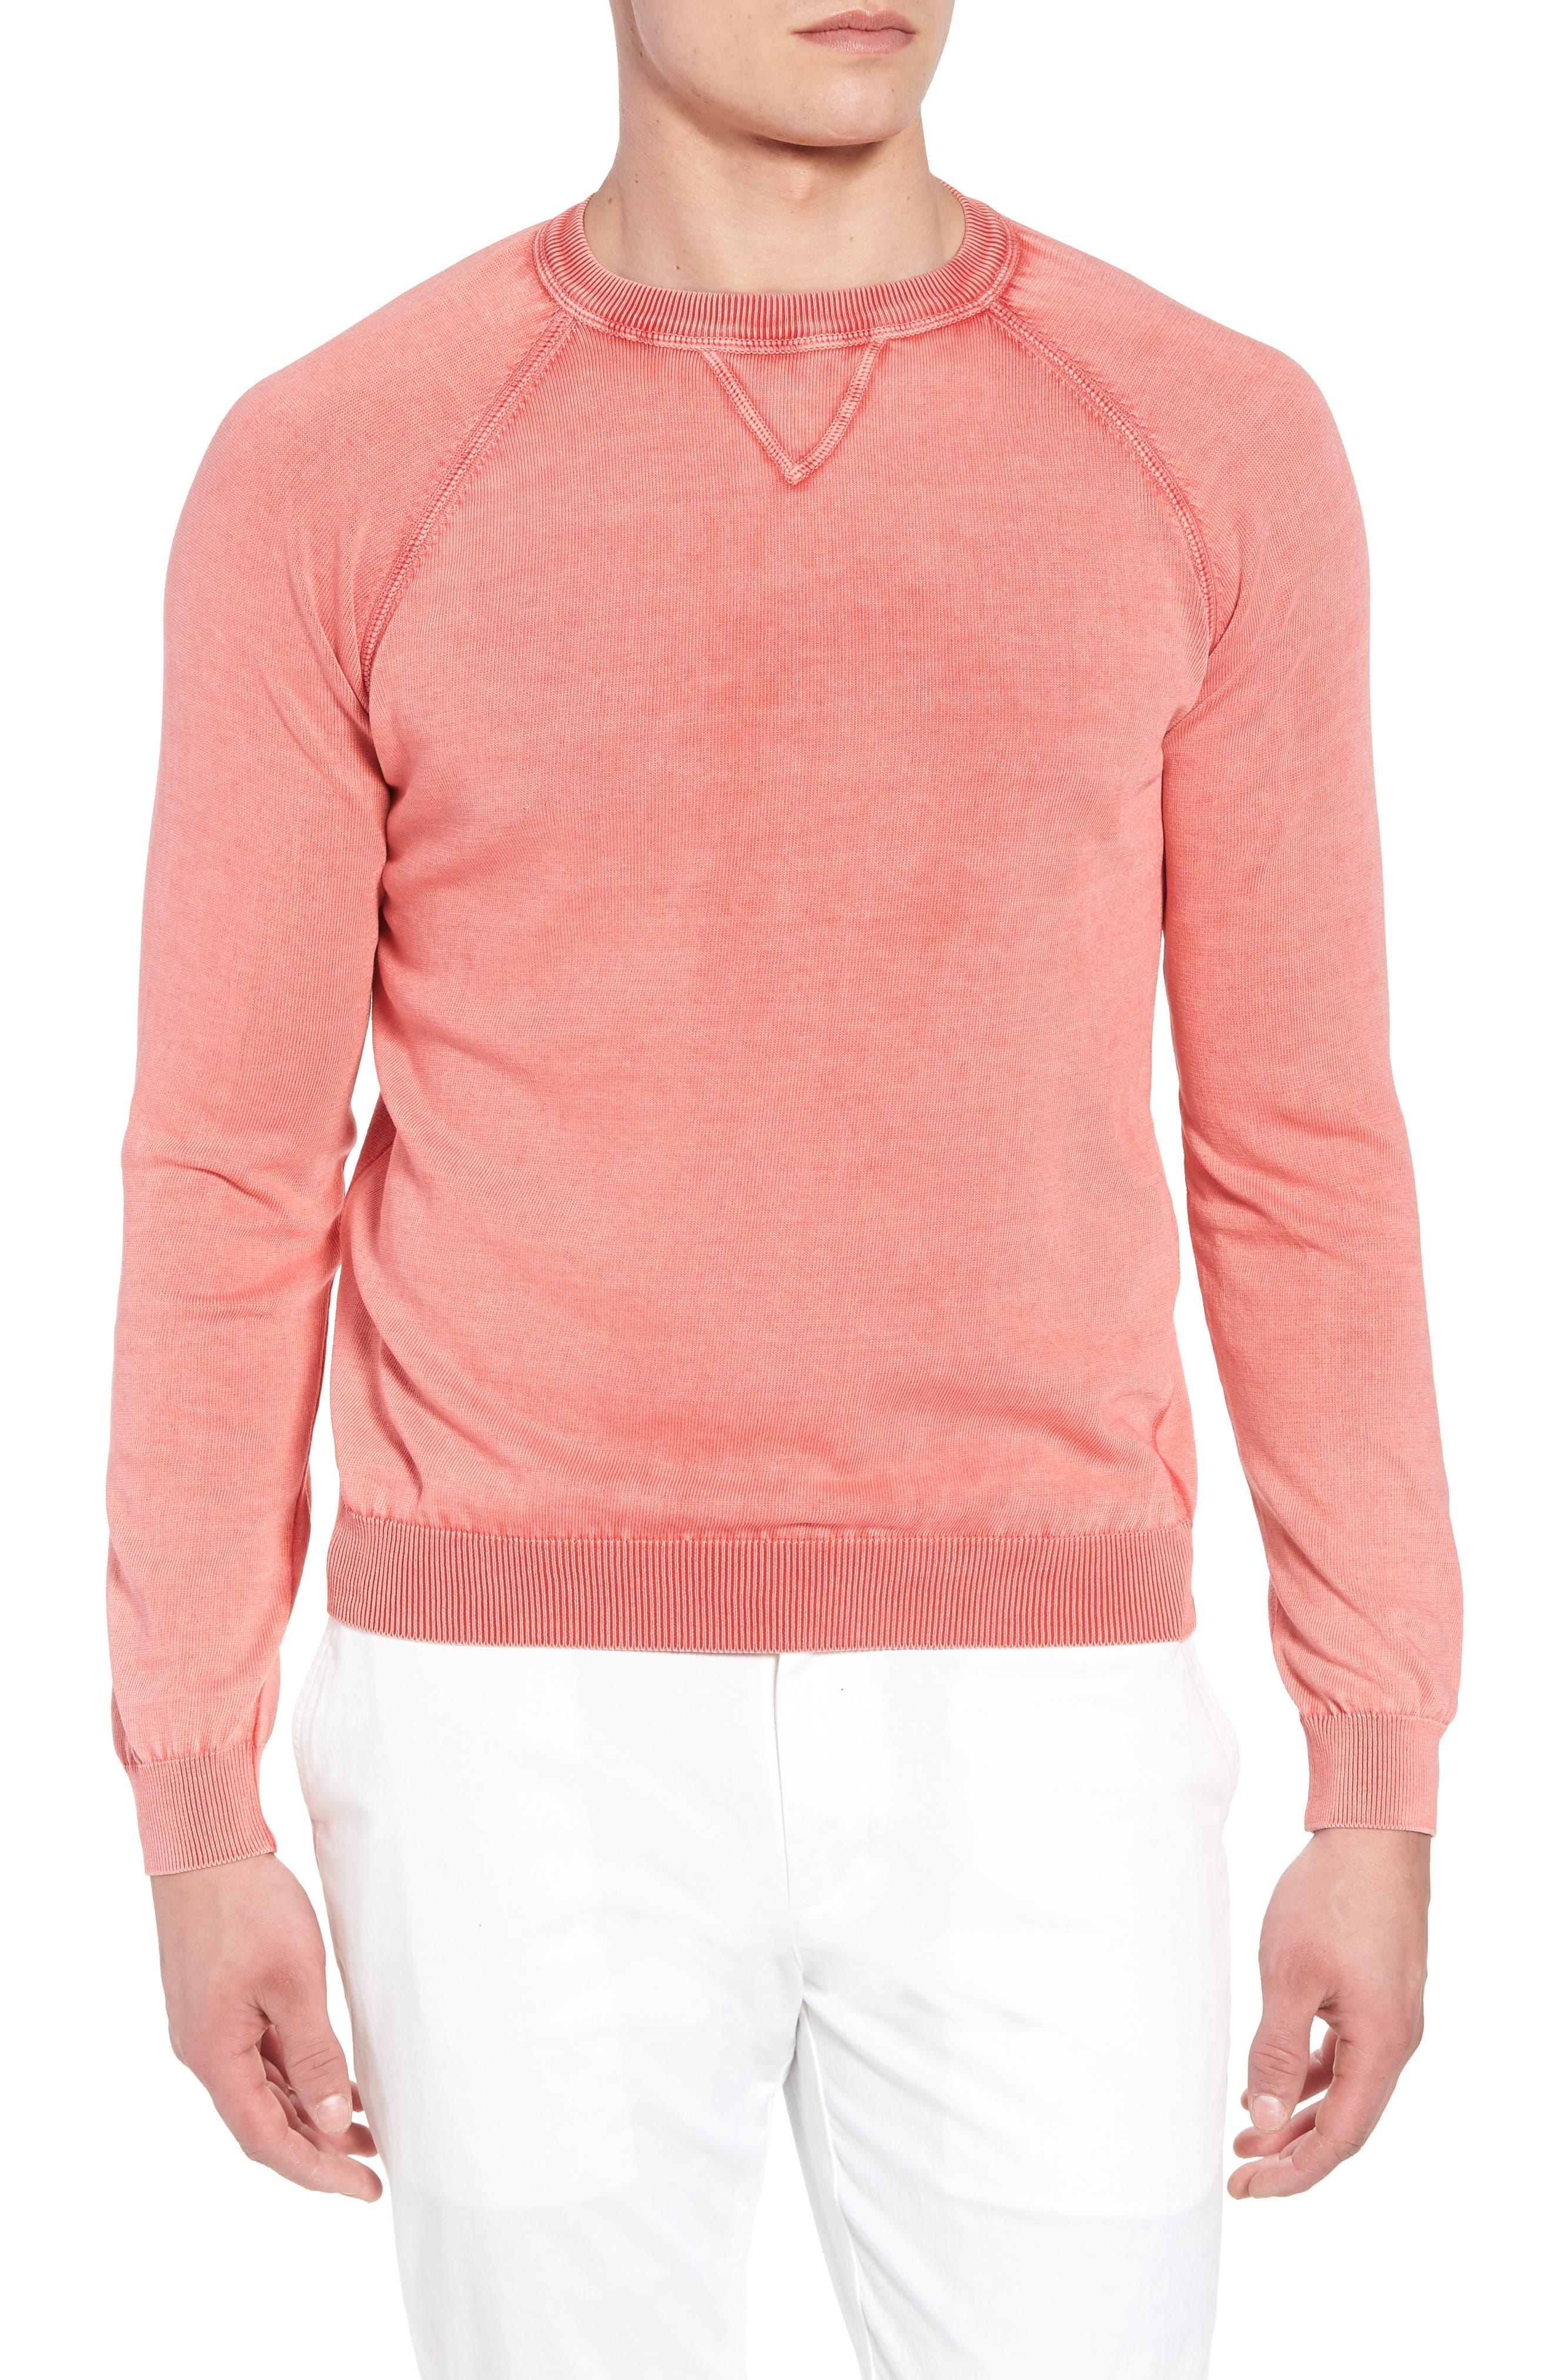 Stonewash Cotton Sweatshirt,                         Main,                         color, 842